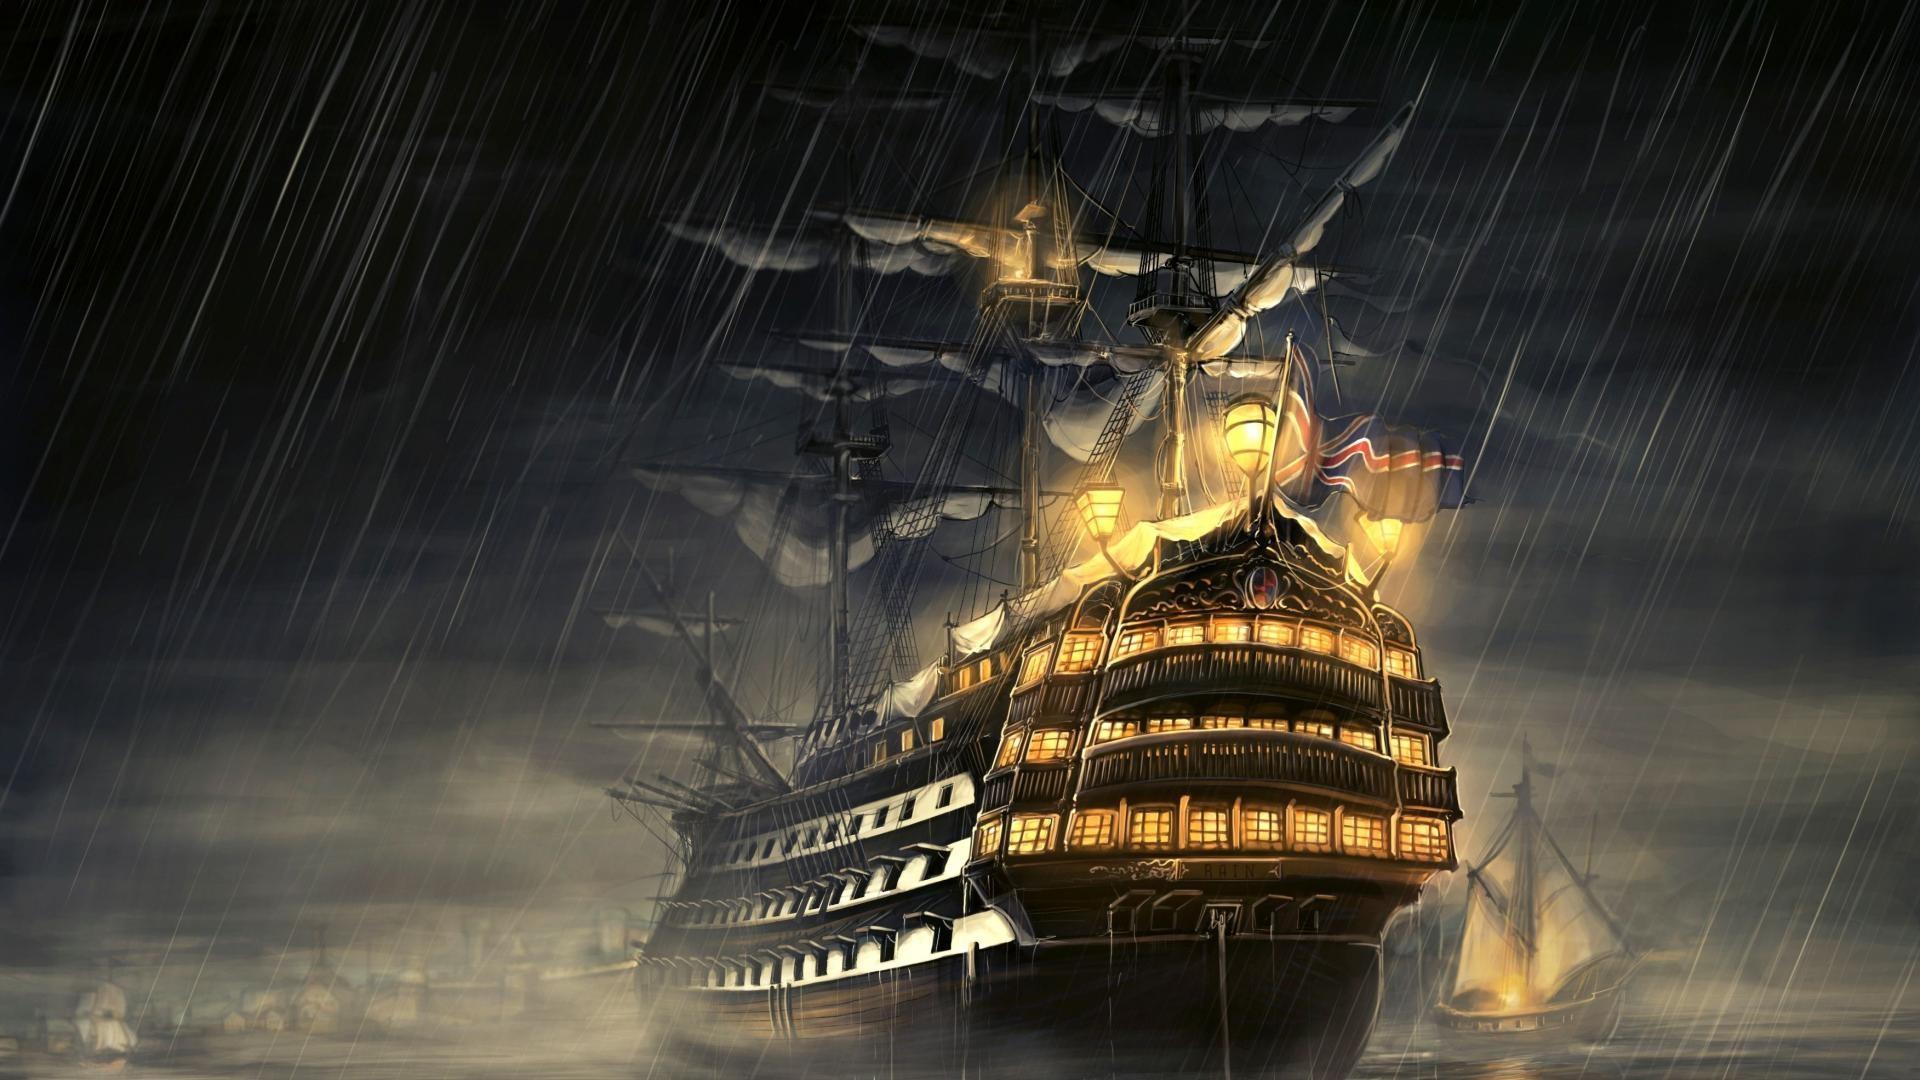 Sea Pirate Wallpaper HD